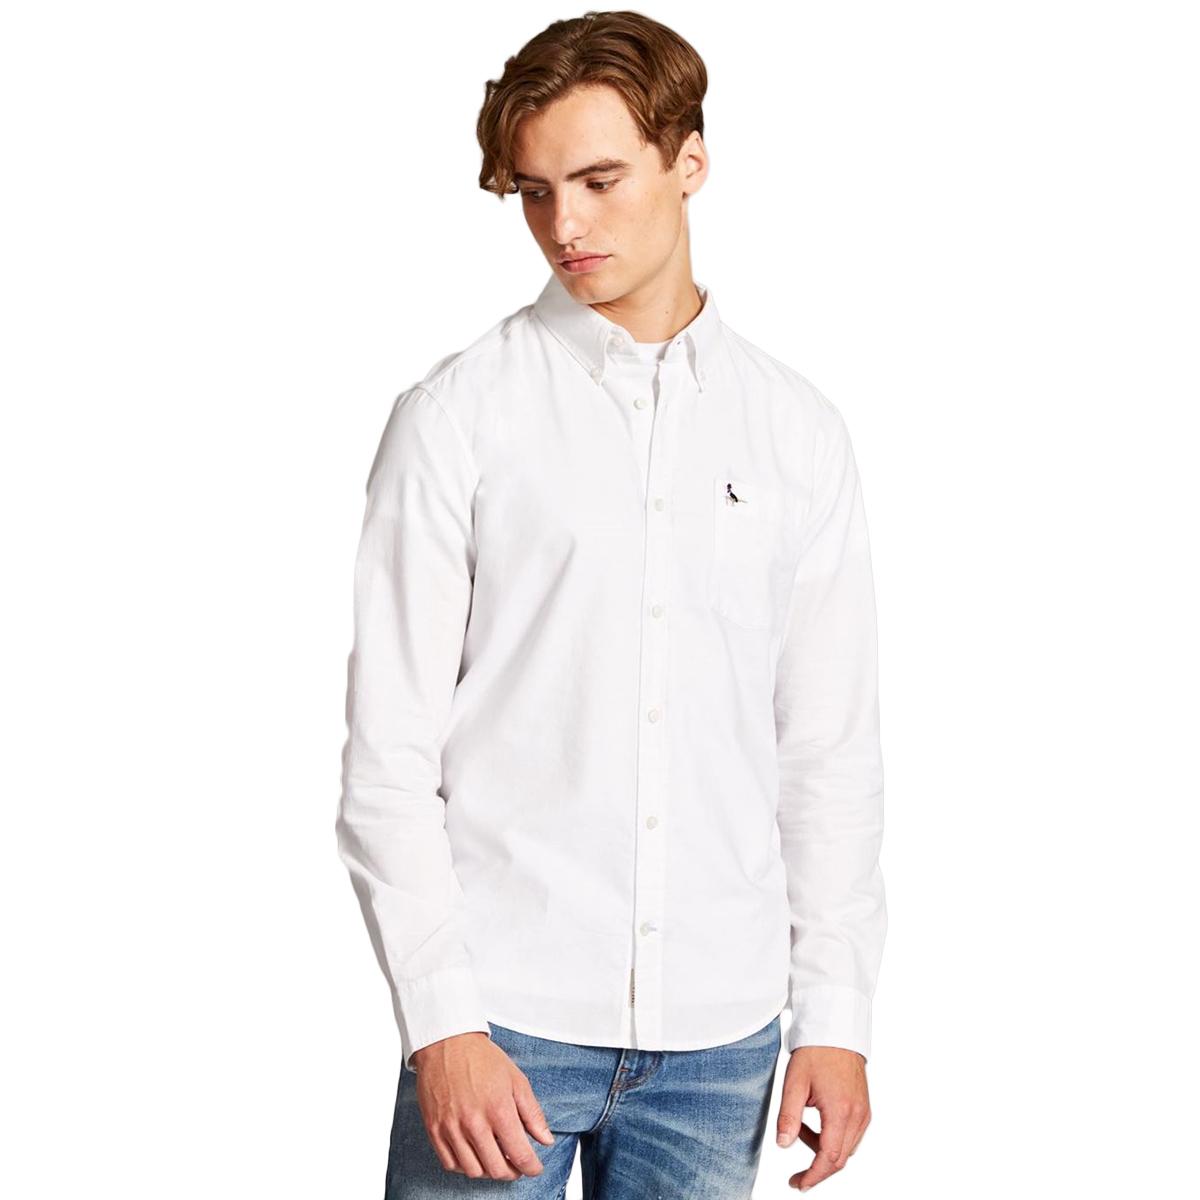 Jack Wills Men's Wadsworth Plain Oxford Shirt - White, L